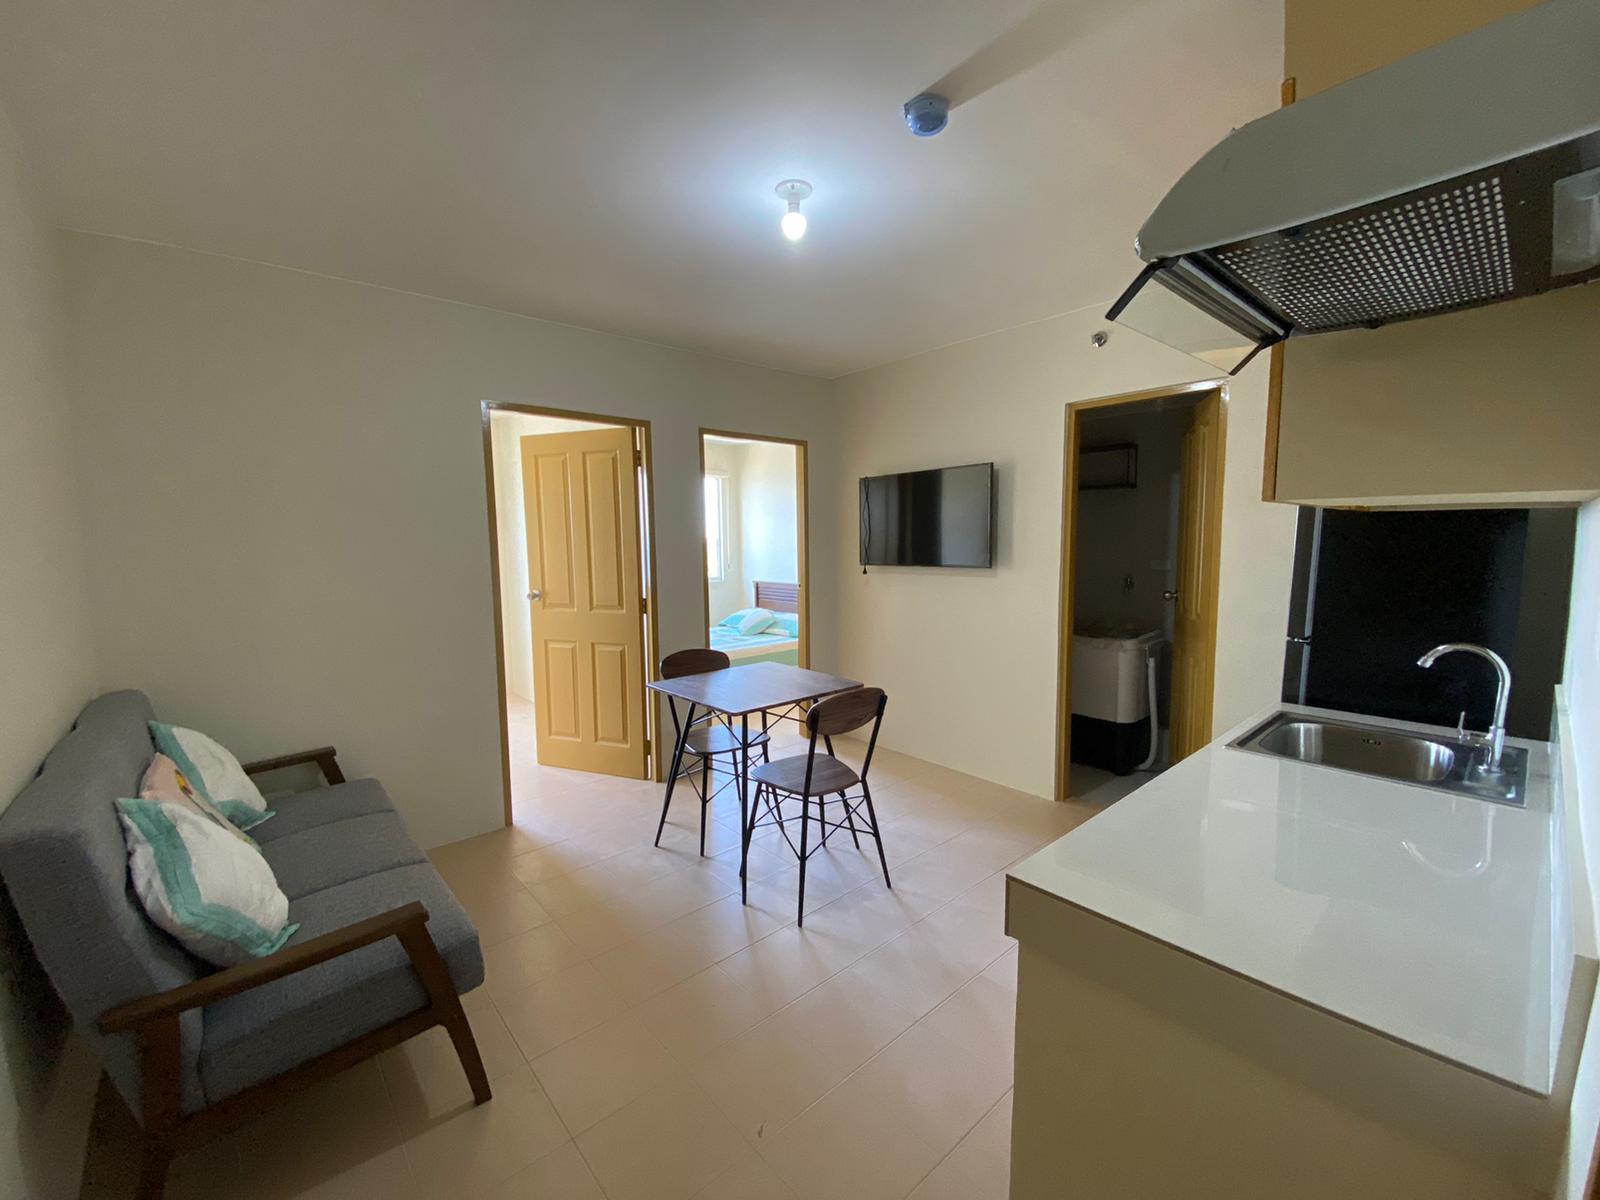 Condo for Rent in Convenient Location